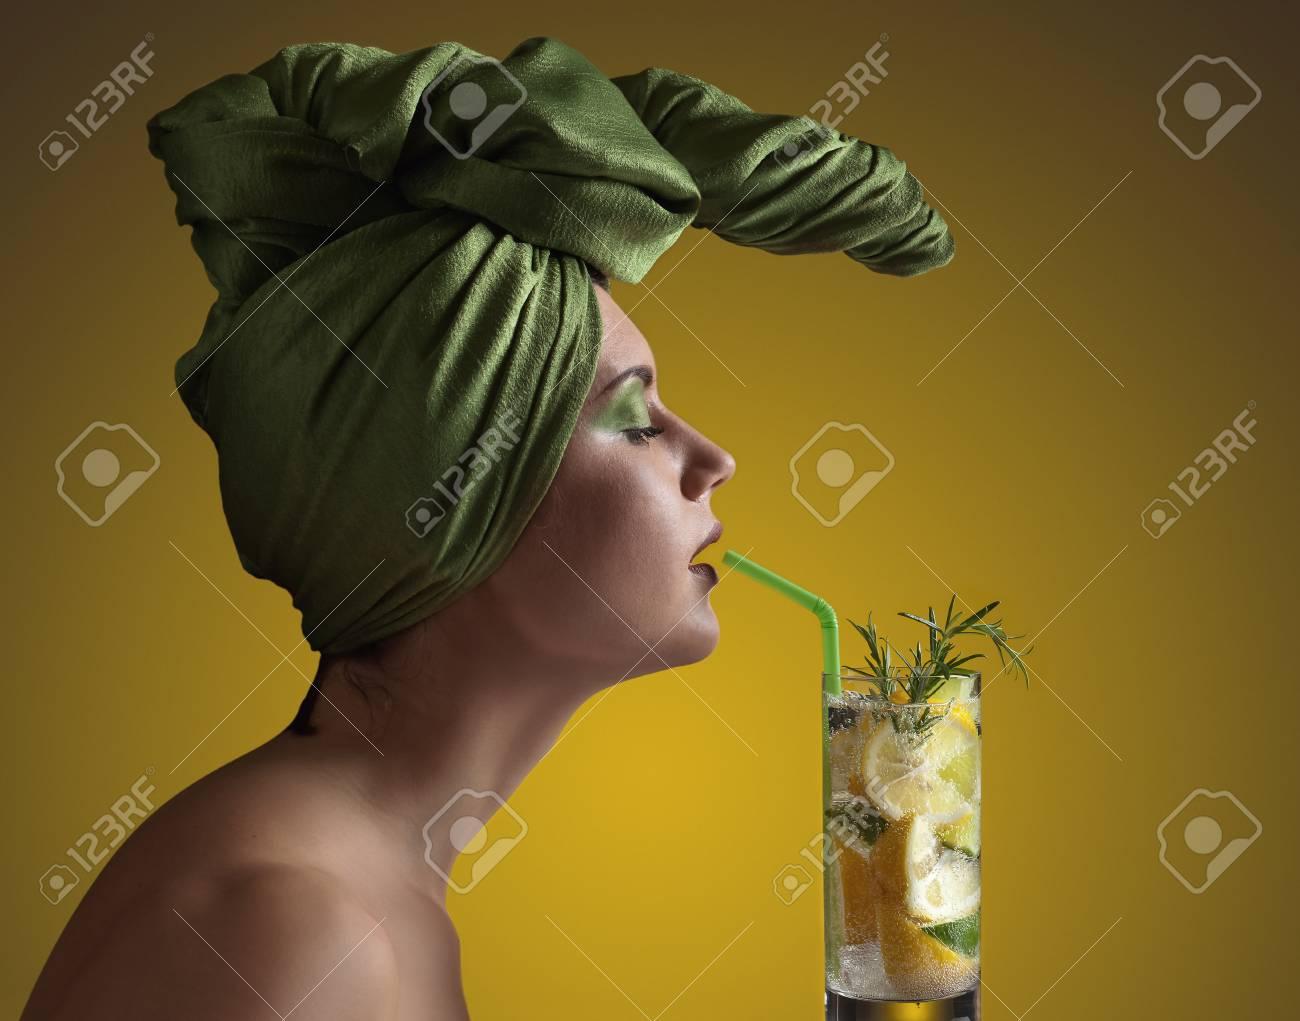 Fullsize Of The Green Turban